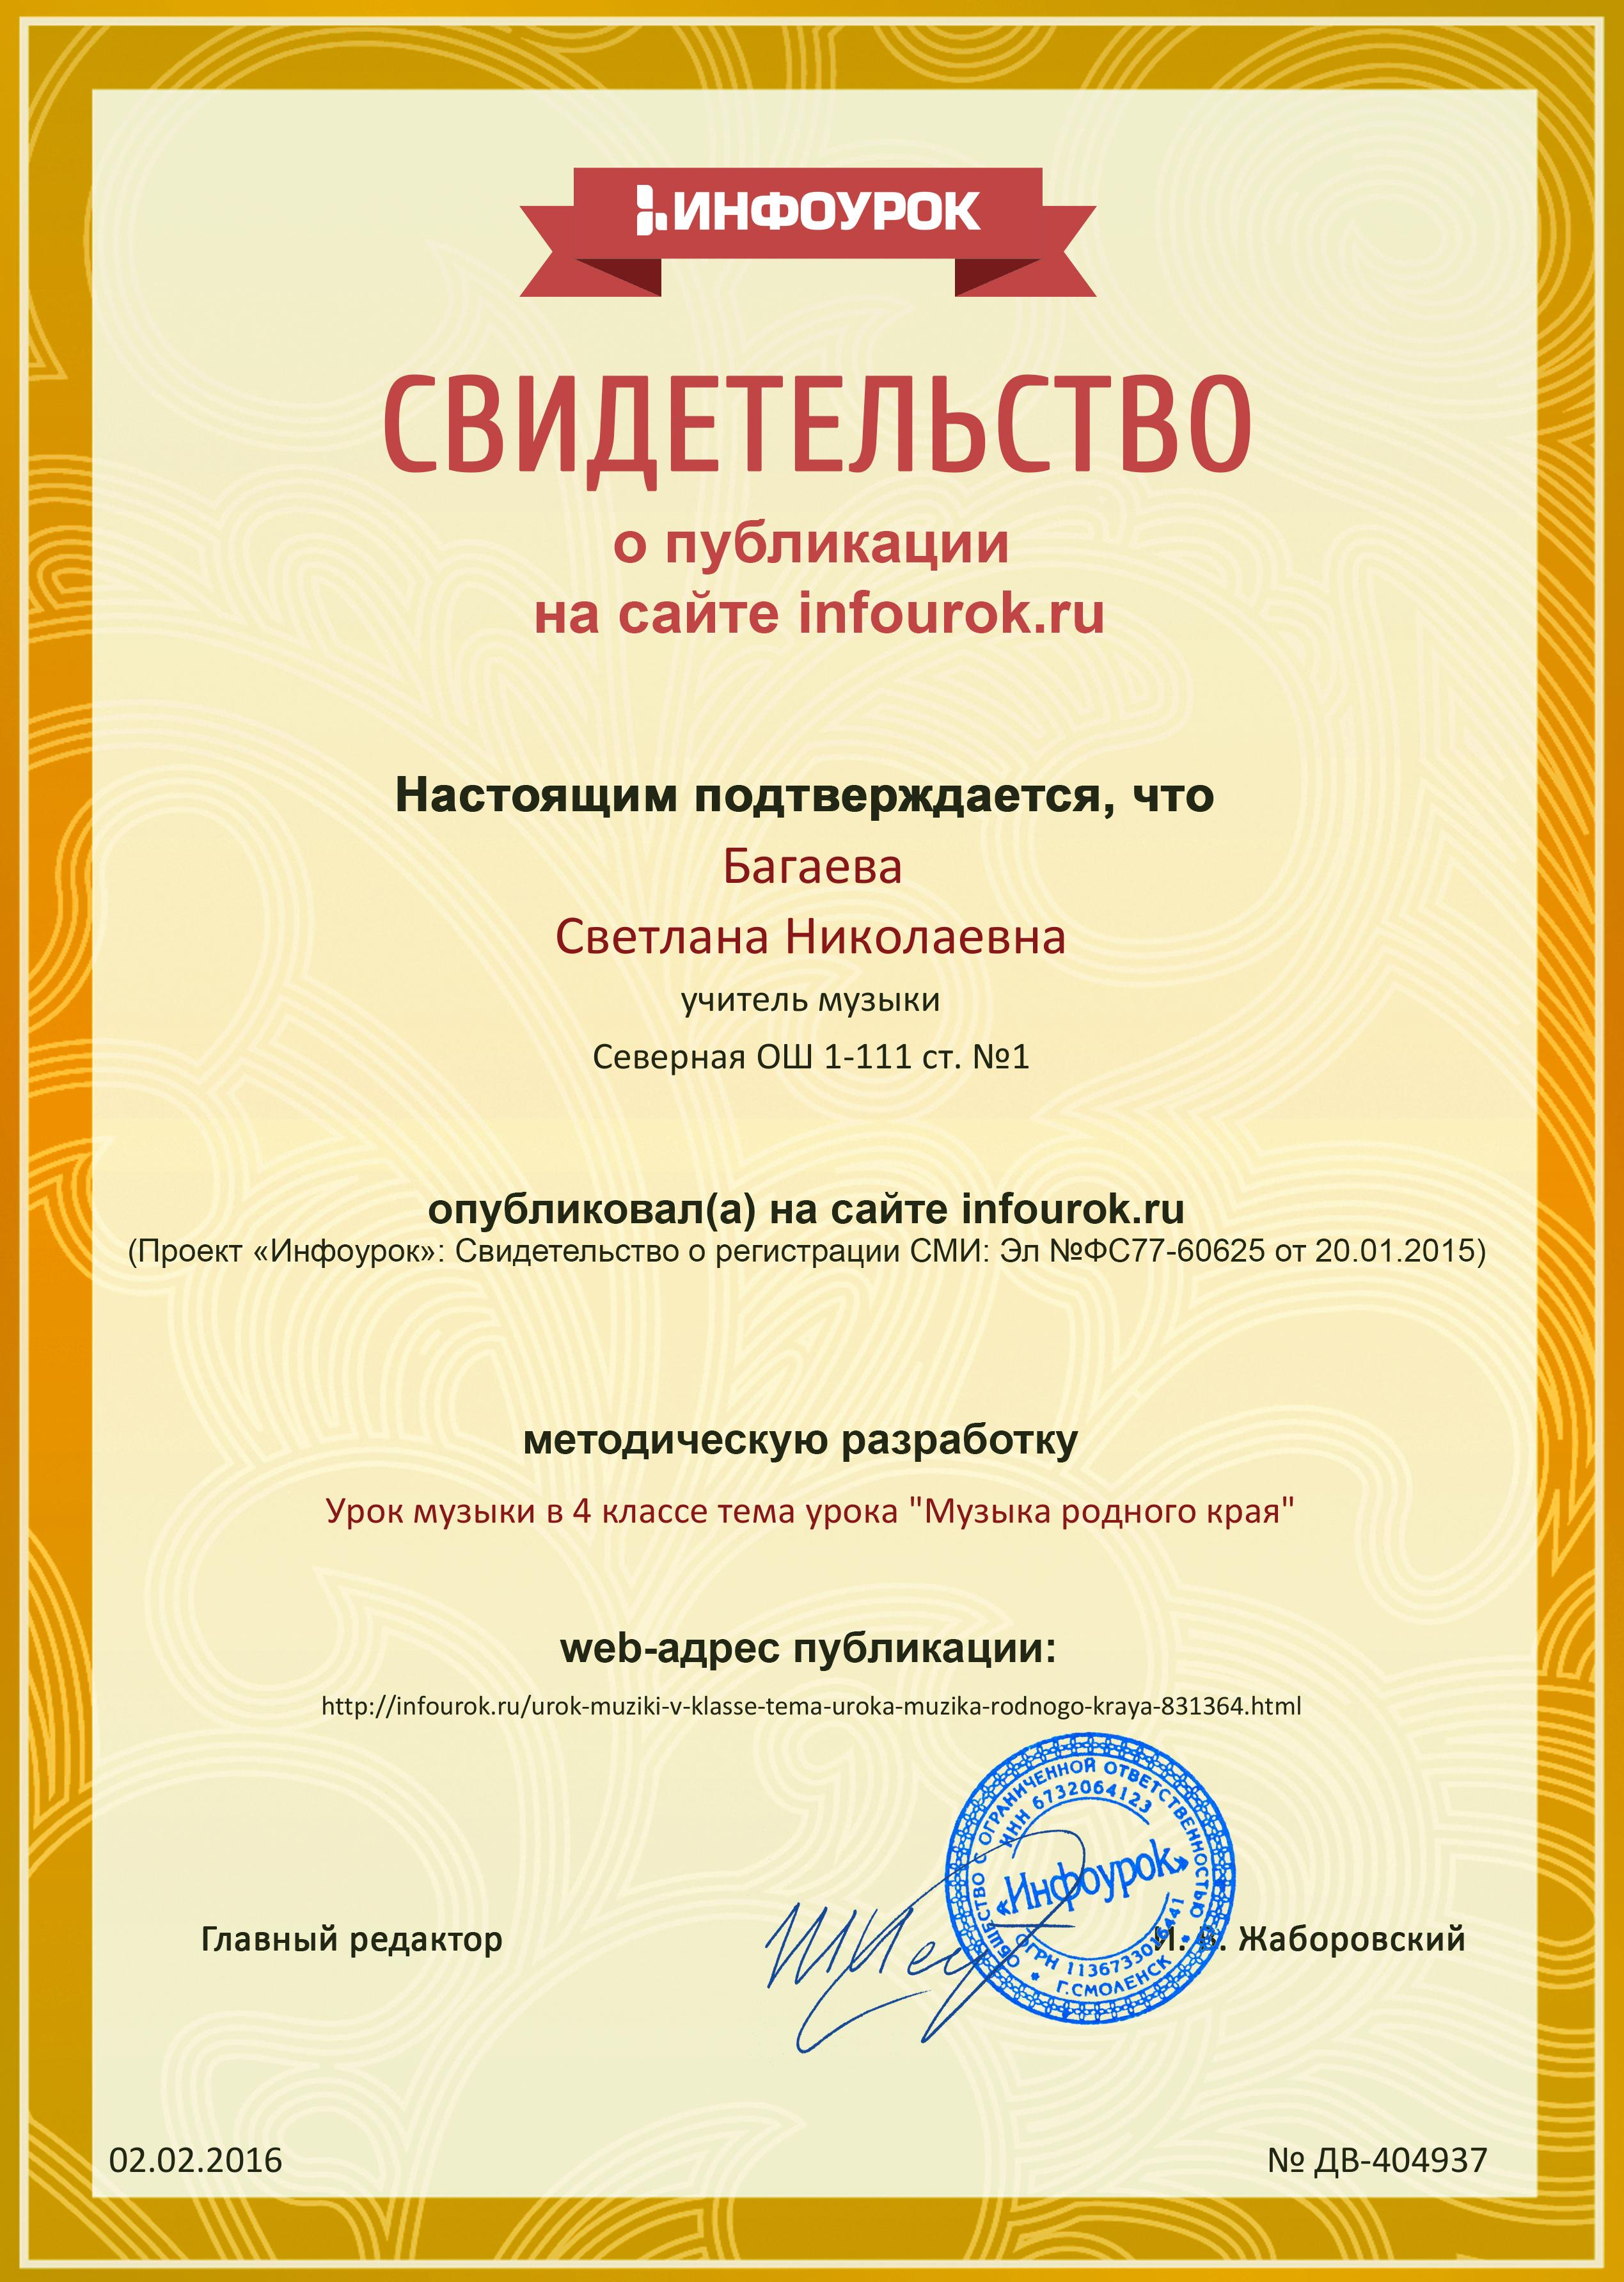 Сертификат проекта infourok.ru № ДВ-404937.jpg